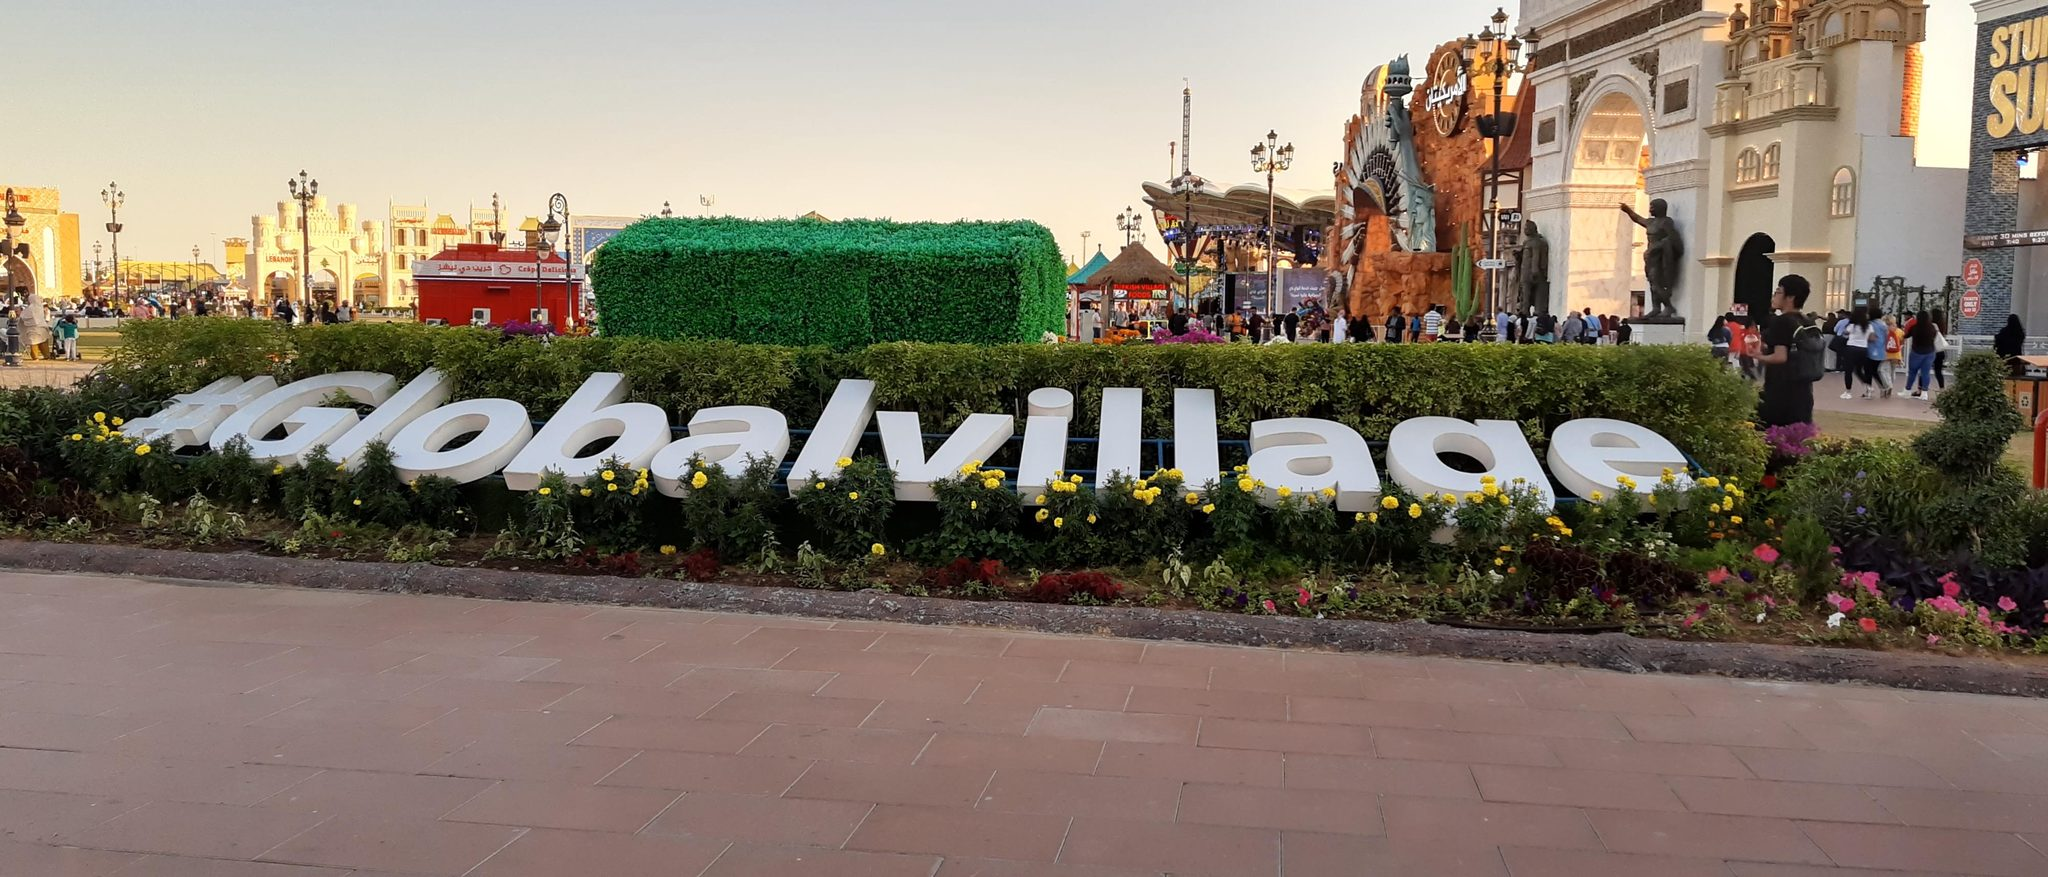 Global Village Dubaj